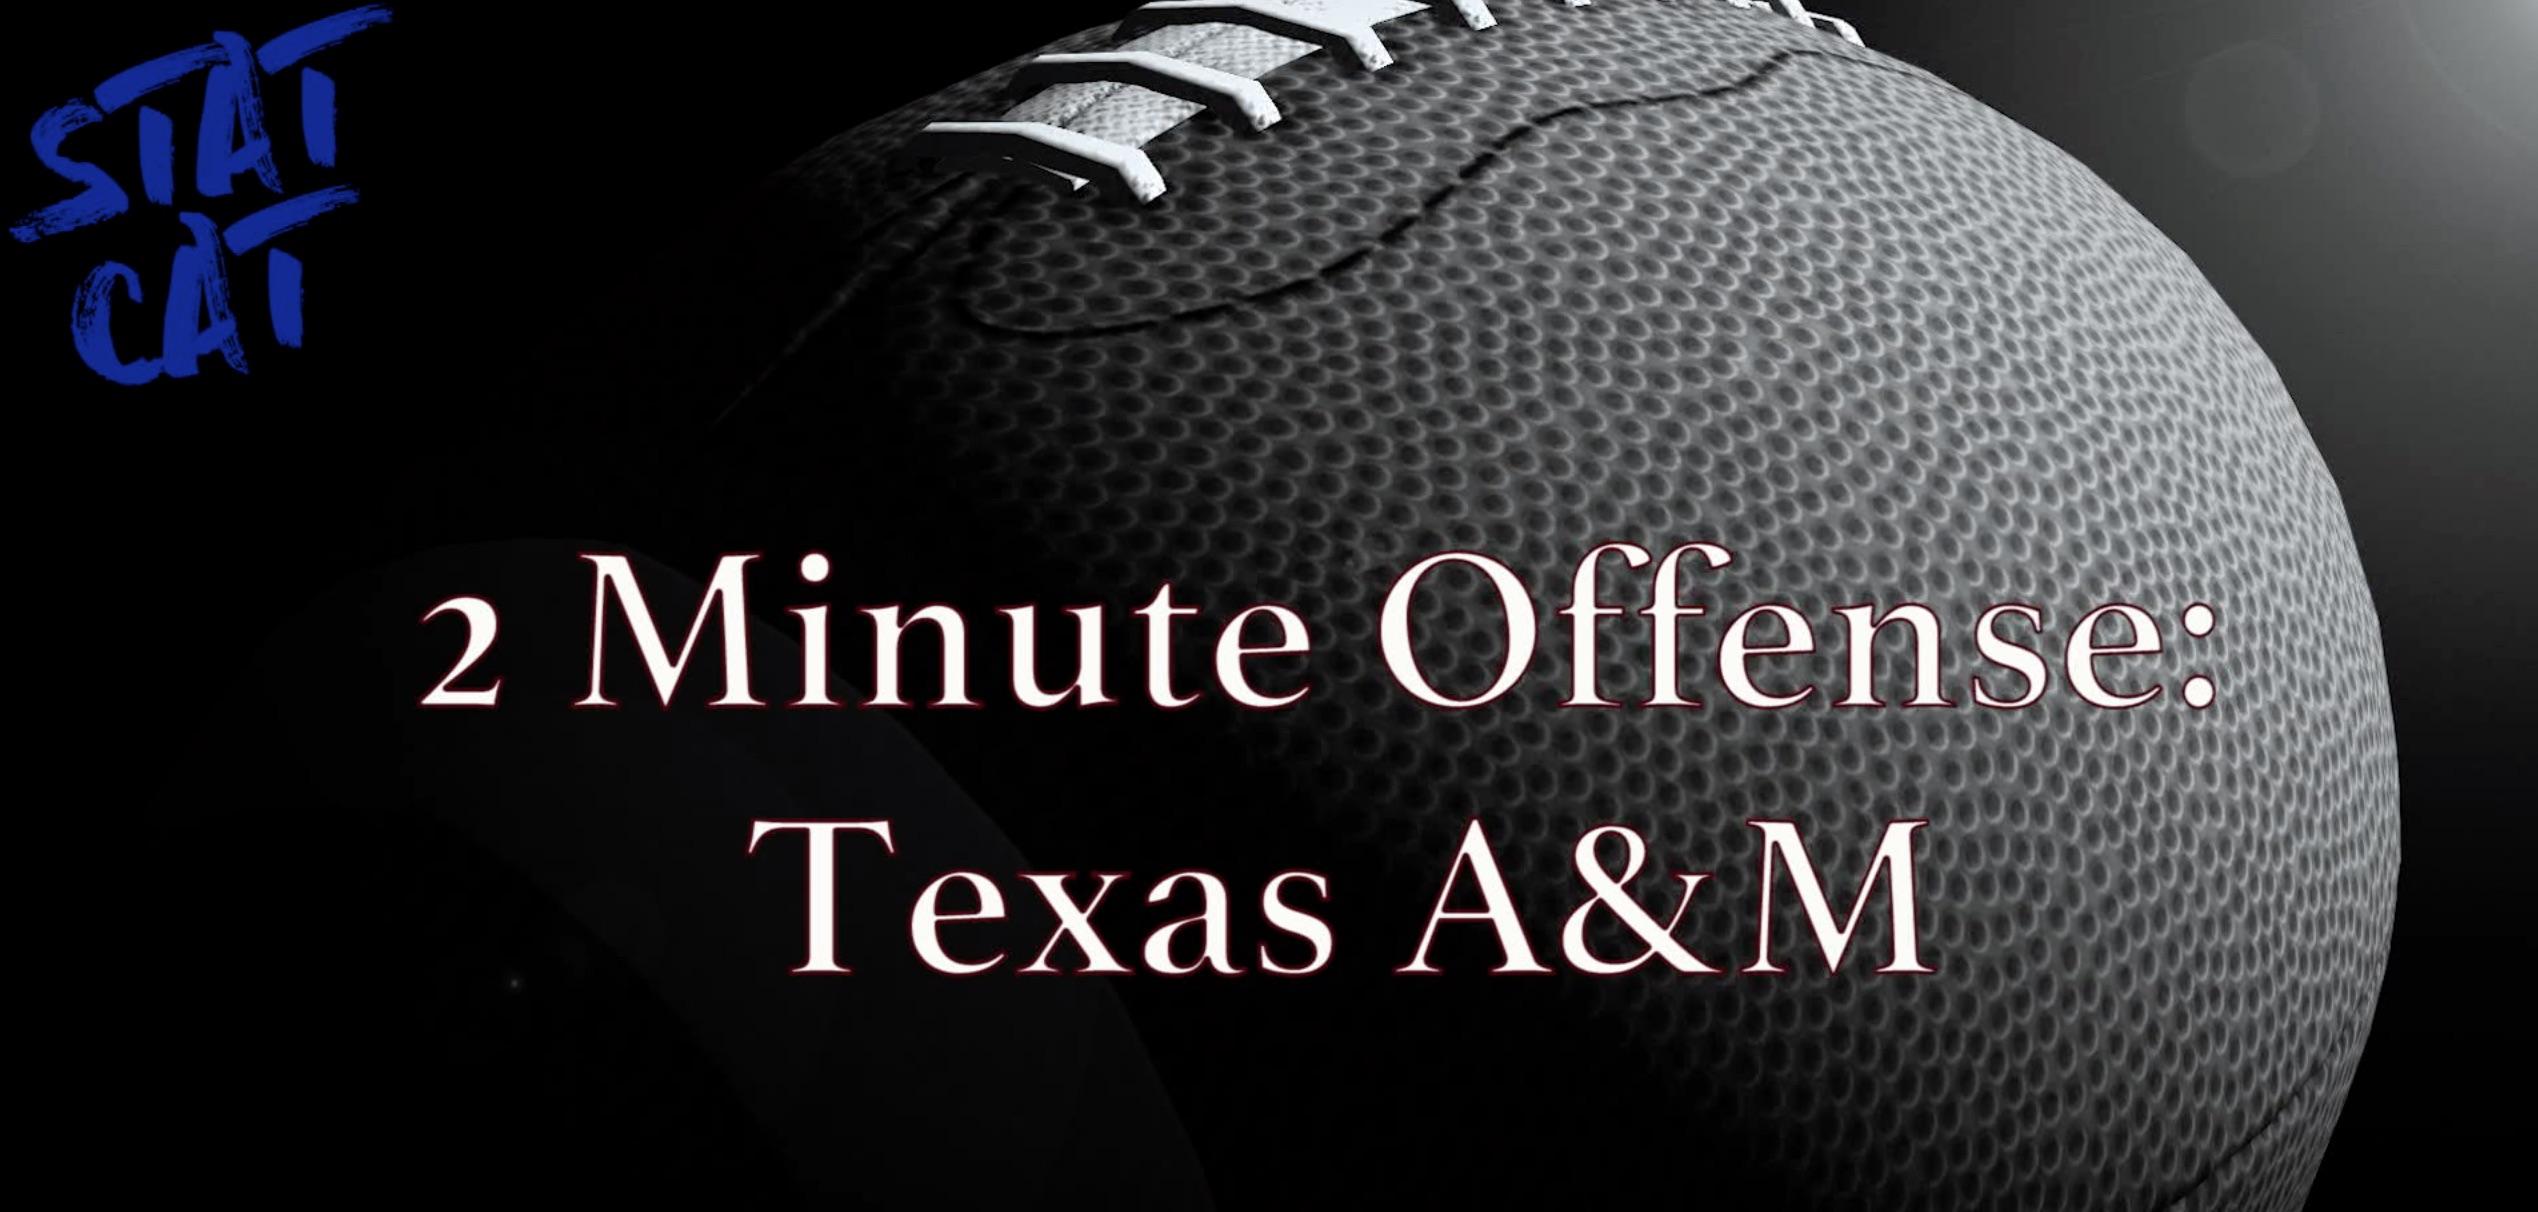 2018 Recap: Texas A&M 2 Minute Offense